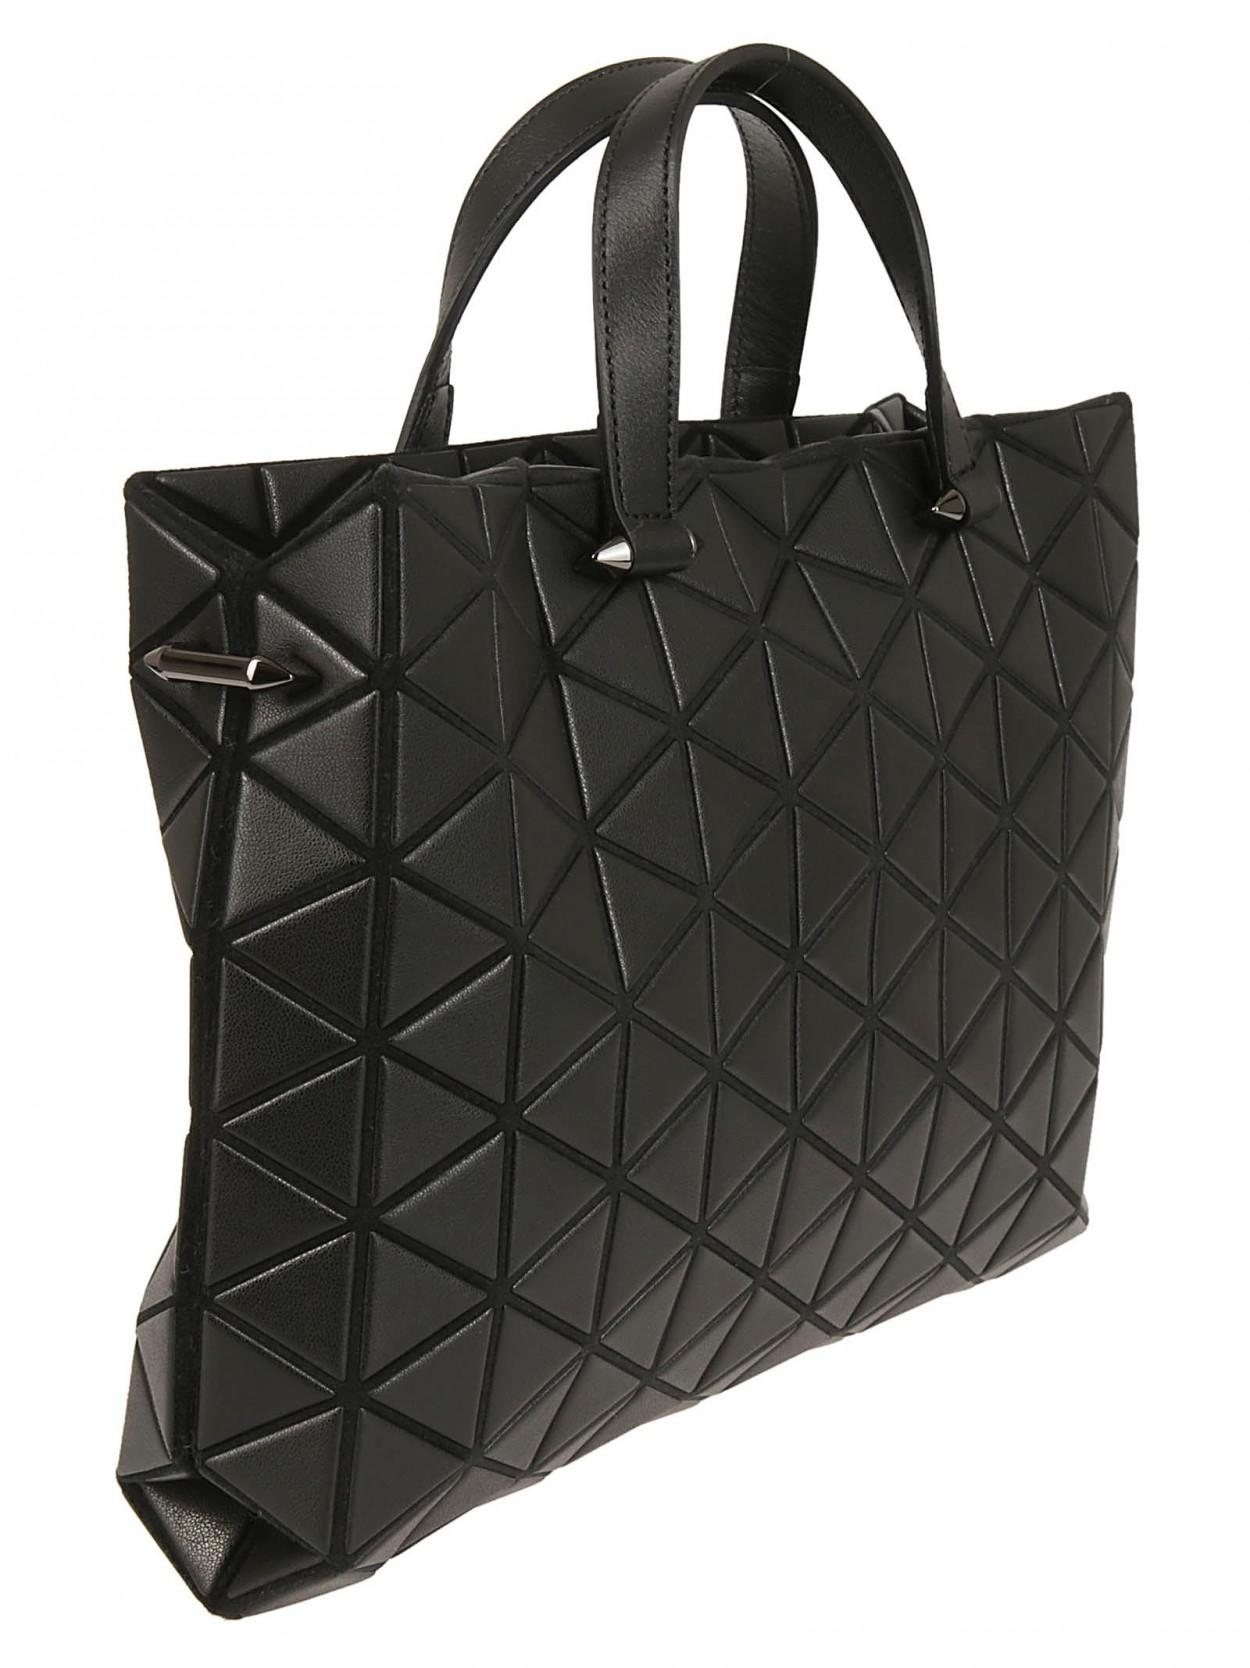 Lyst - Bao Bao Issey Miyake Tonneau Matte Small Boston Bag in Black - Save  7% 449f489ba3917